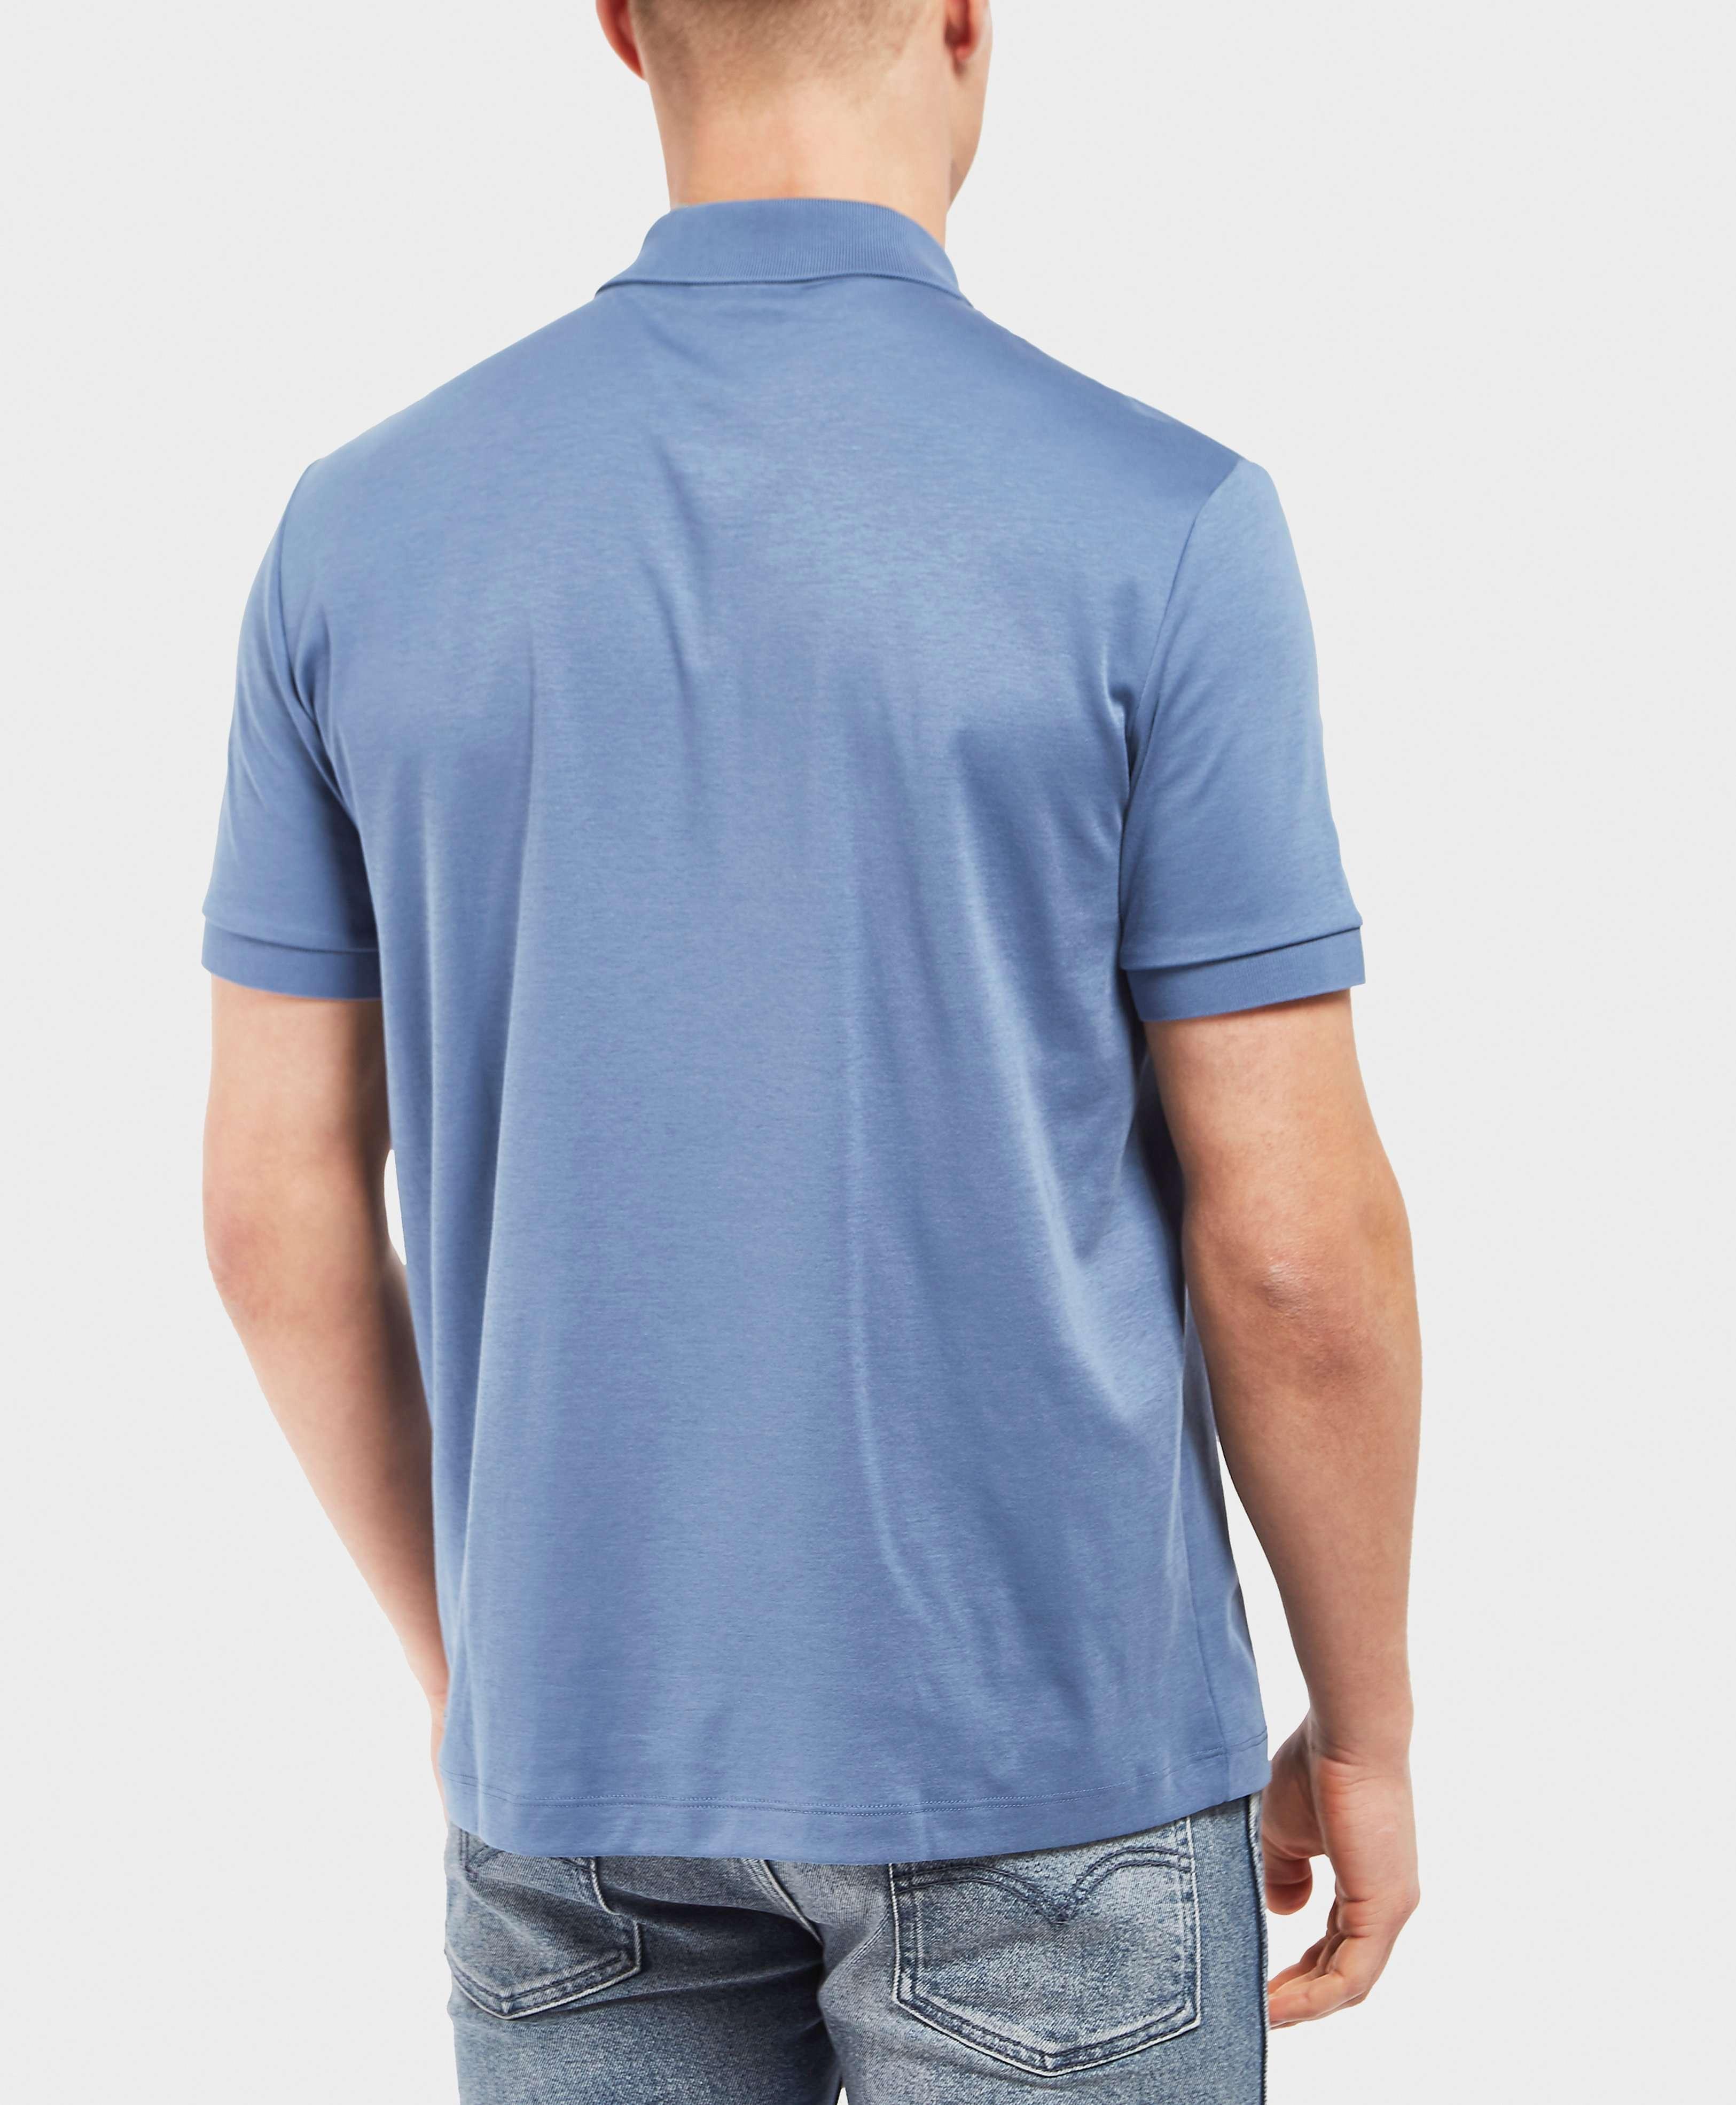 Lacoste Regular Jersey Short Sleeve Polo Shirt